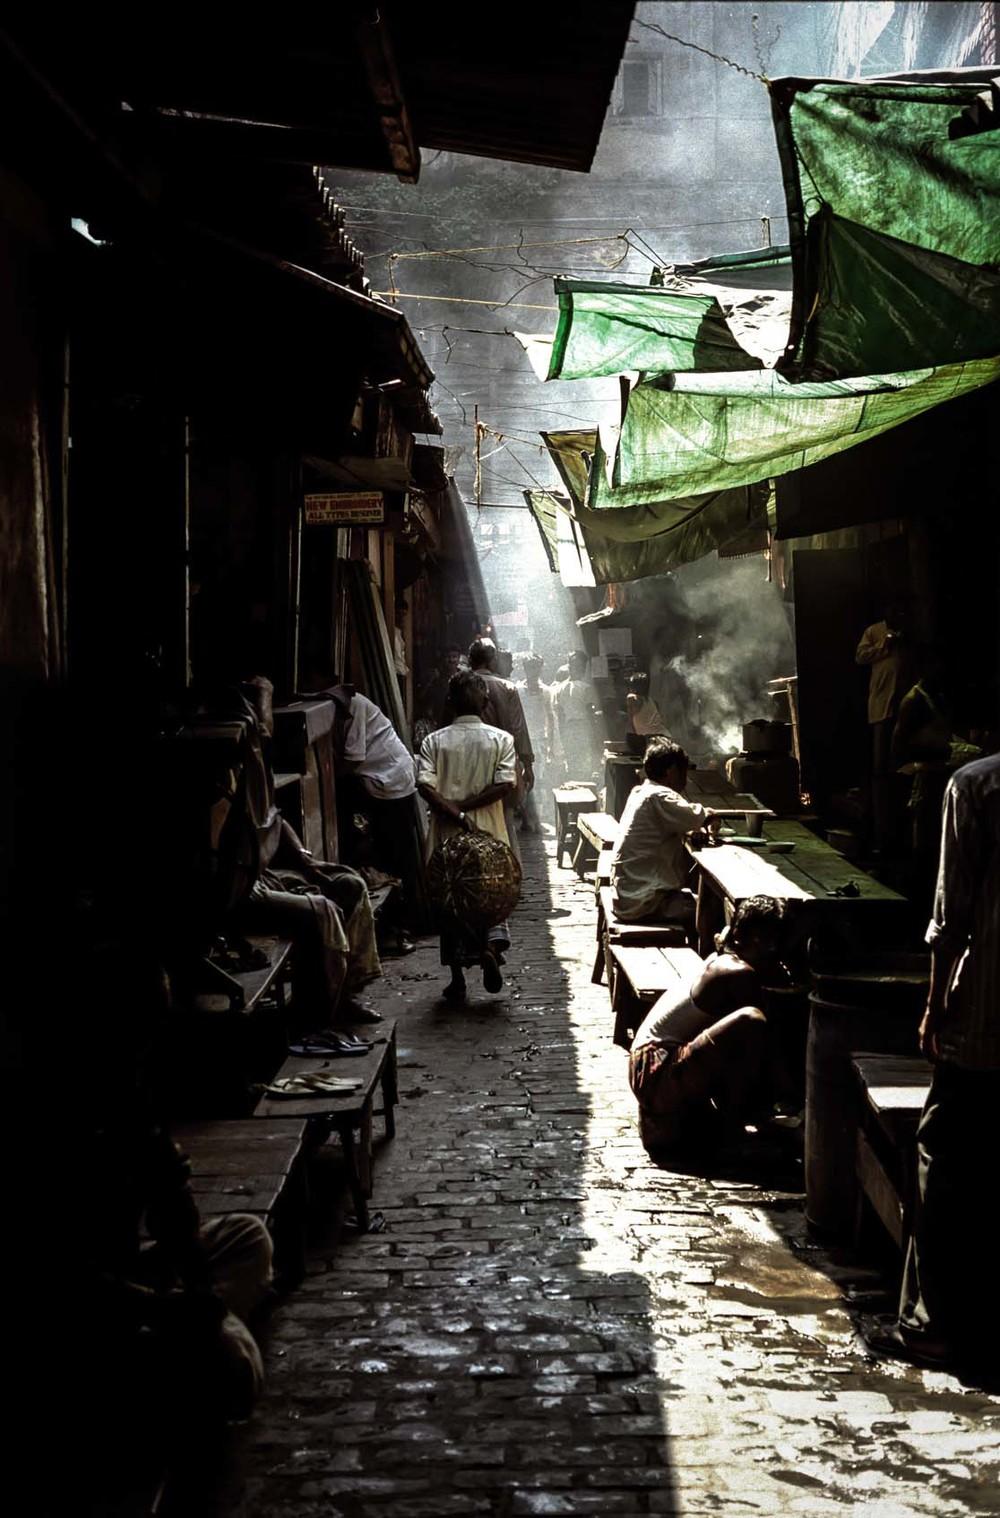 Backstreet market, Calcutta